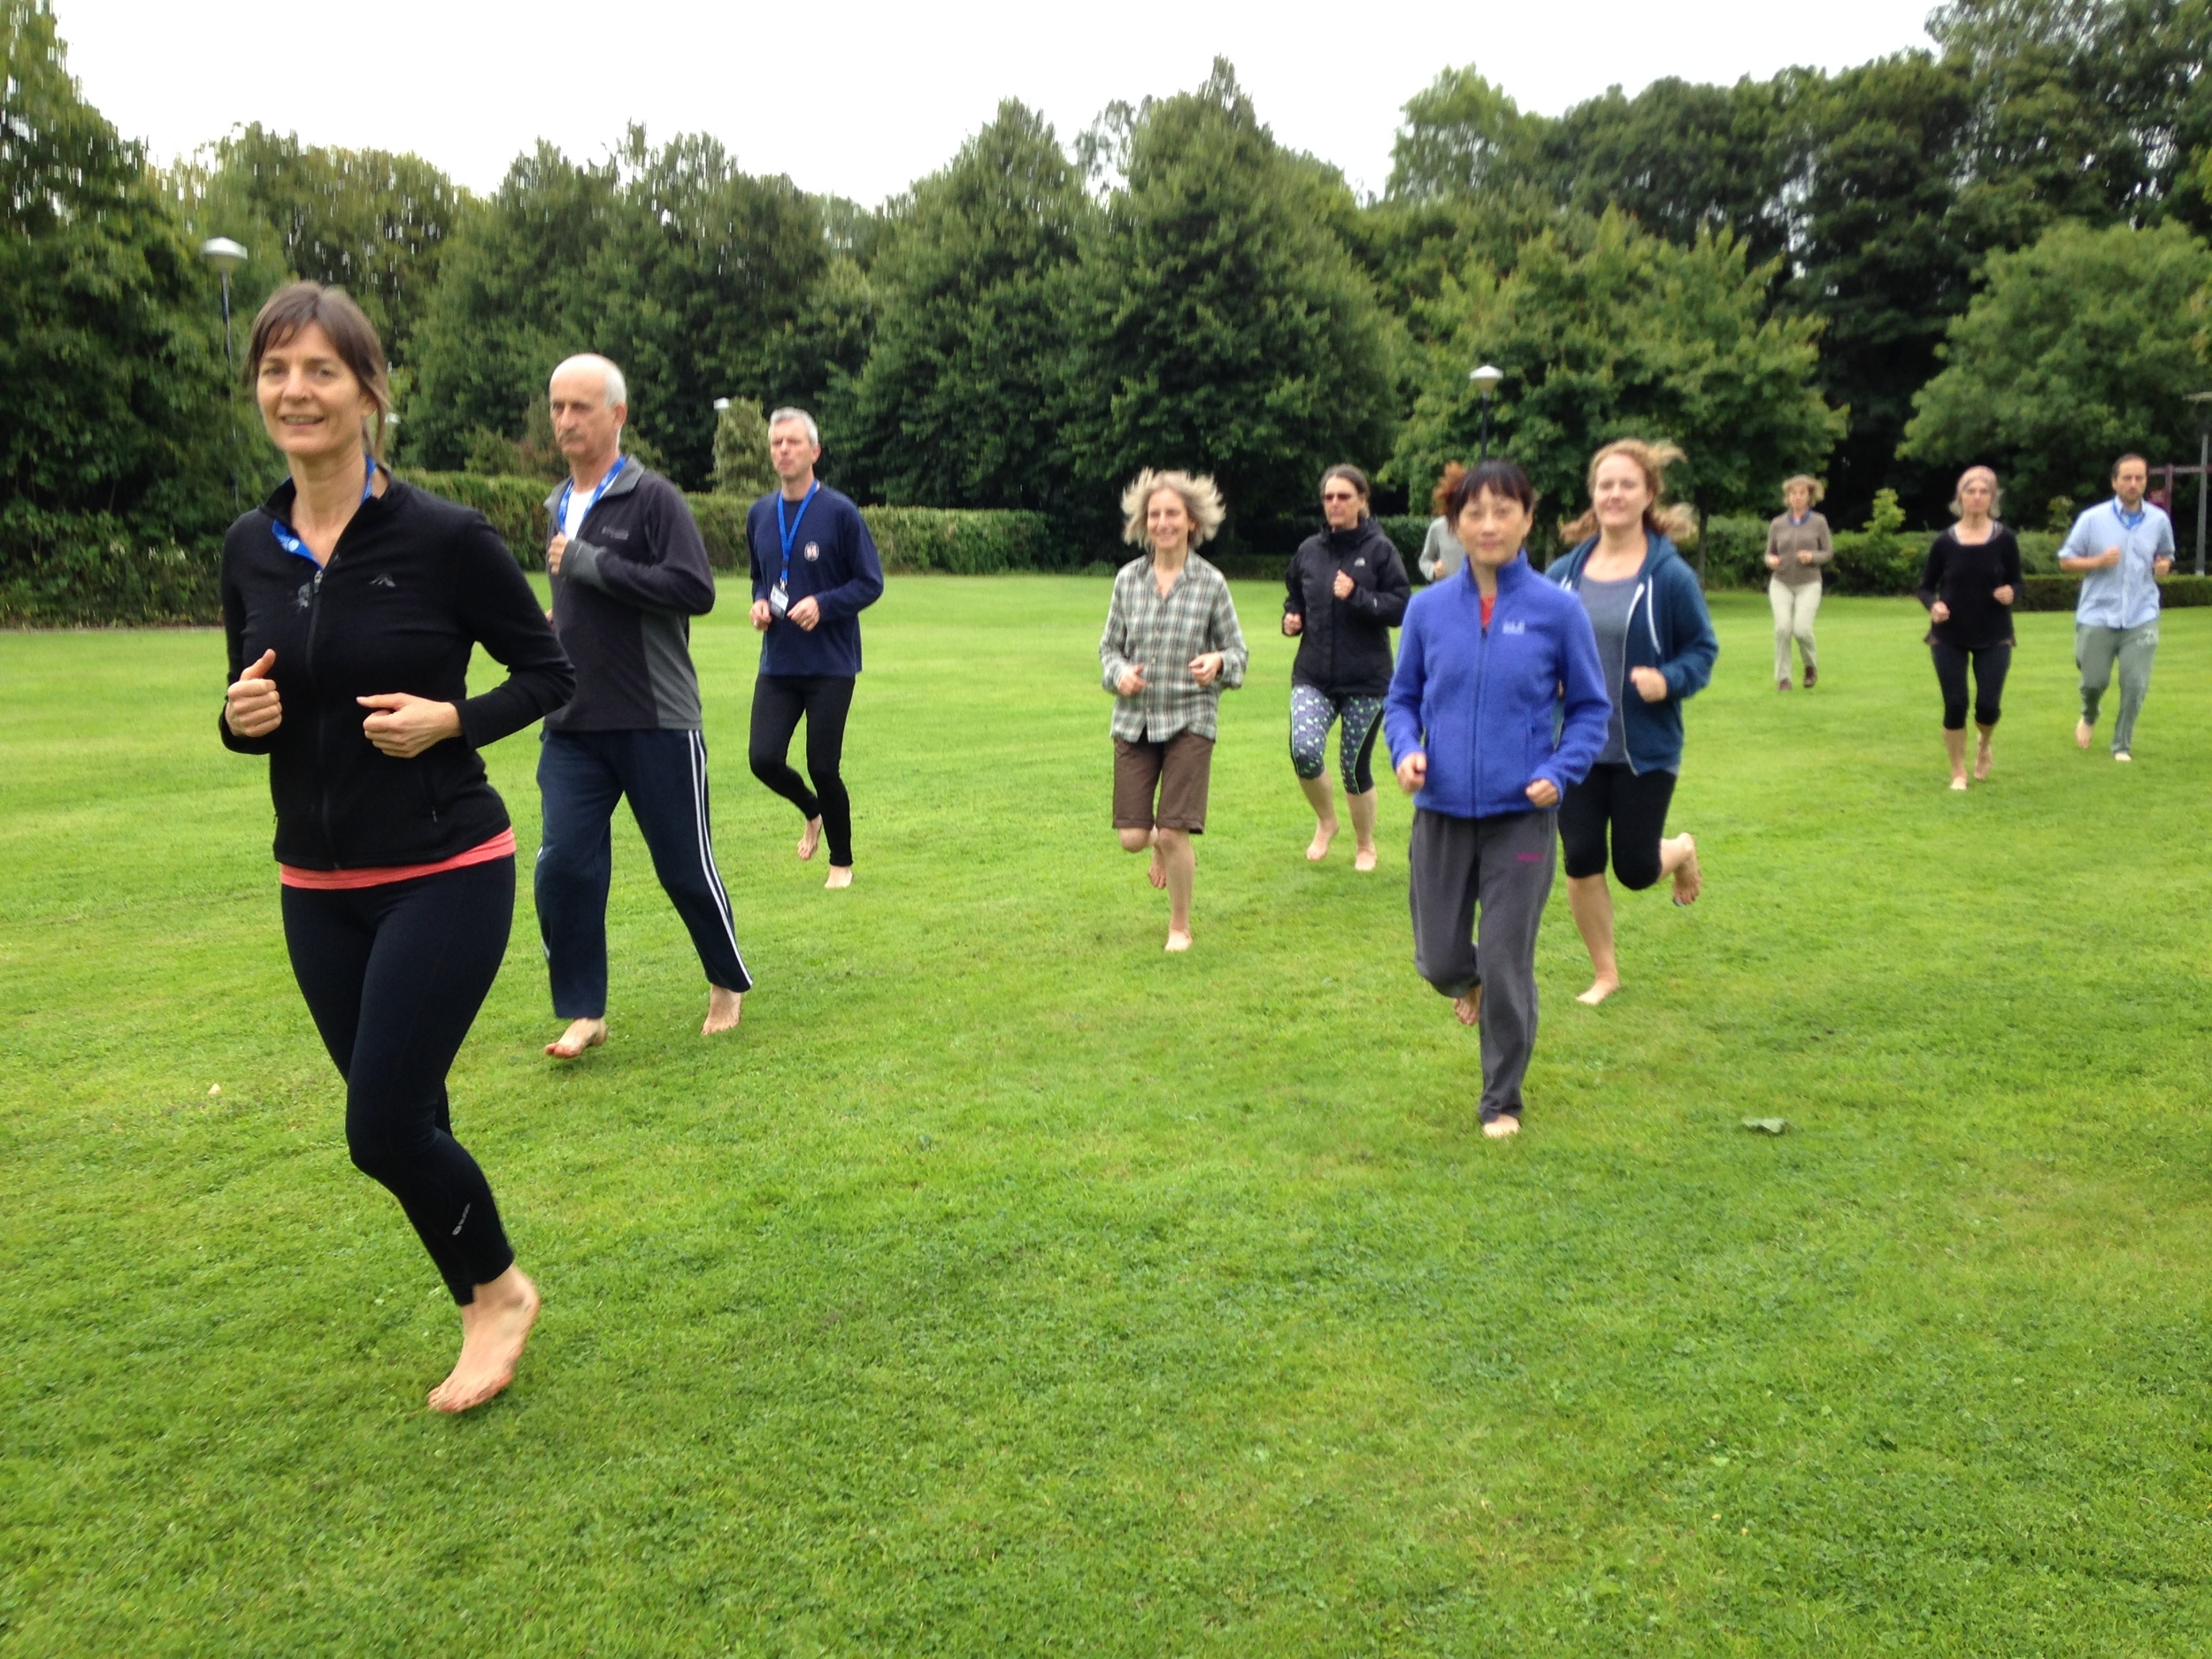 Master the Art of Running workshop in Limerick, Ireland. August '15